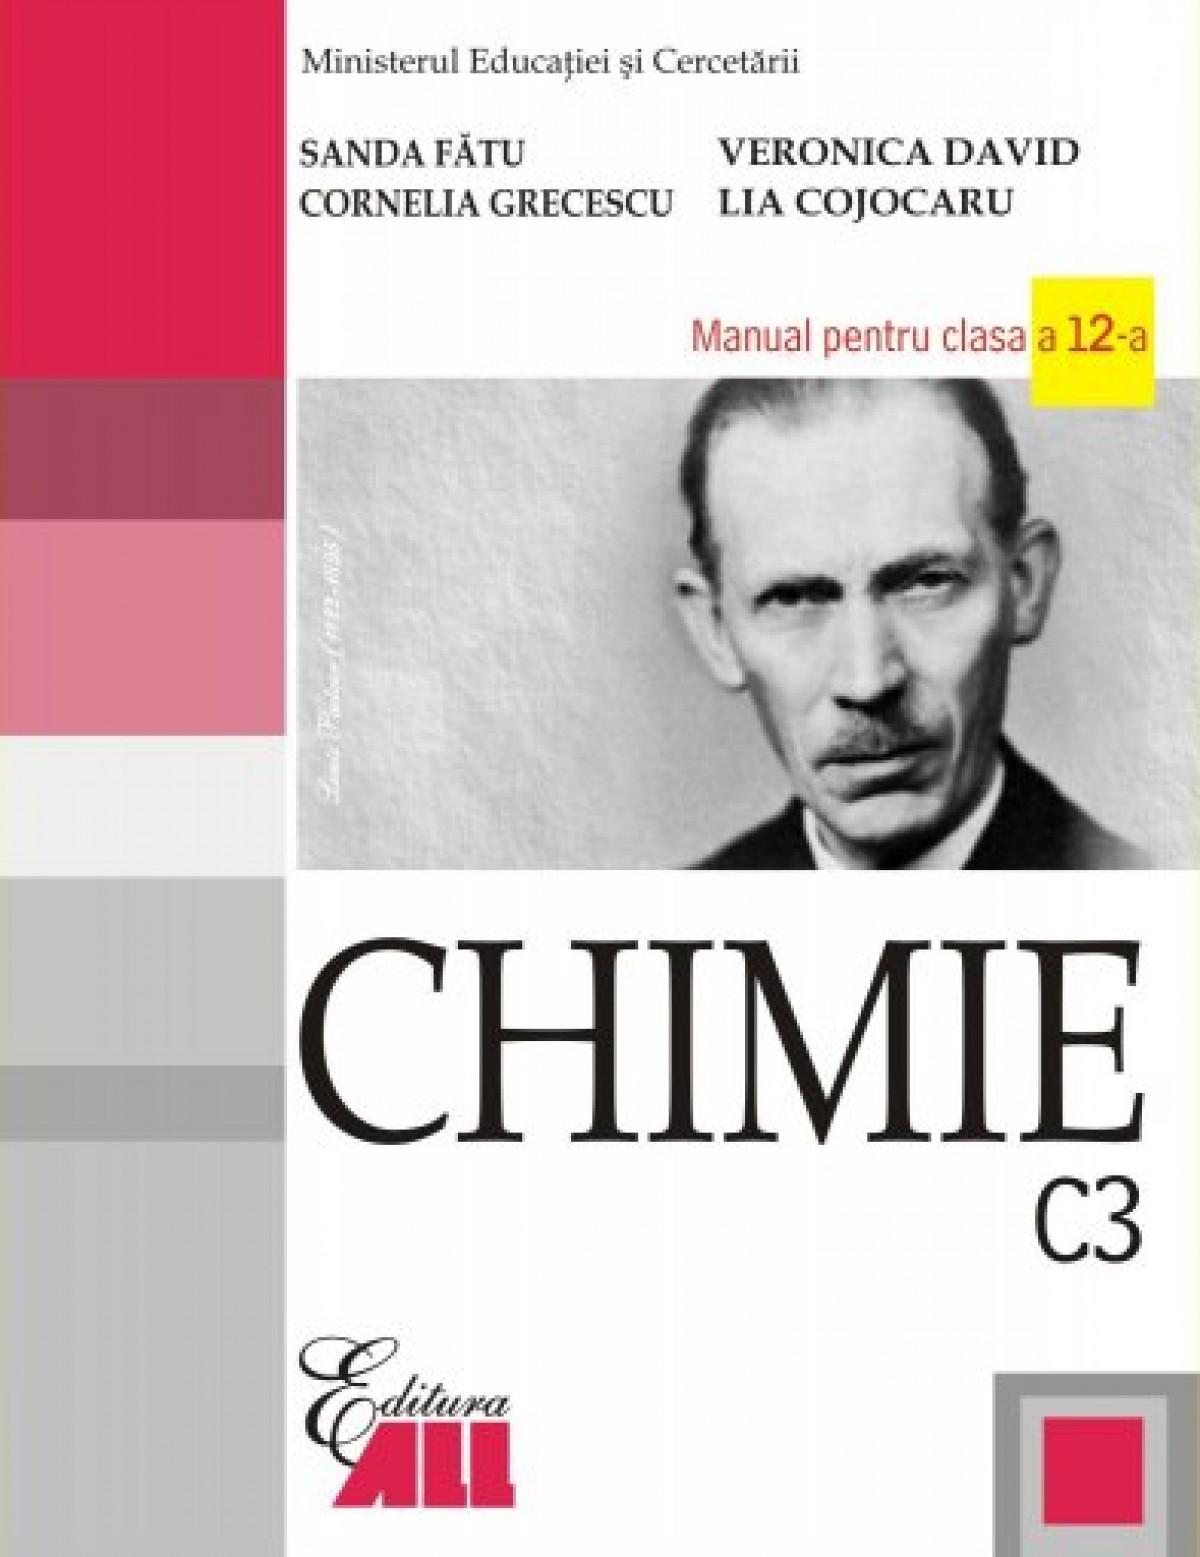 Chimie (C3). Manual pentru clasa a XII-a